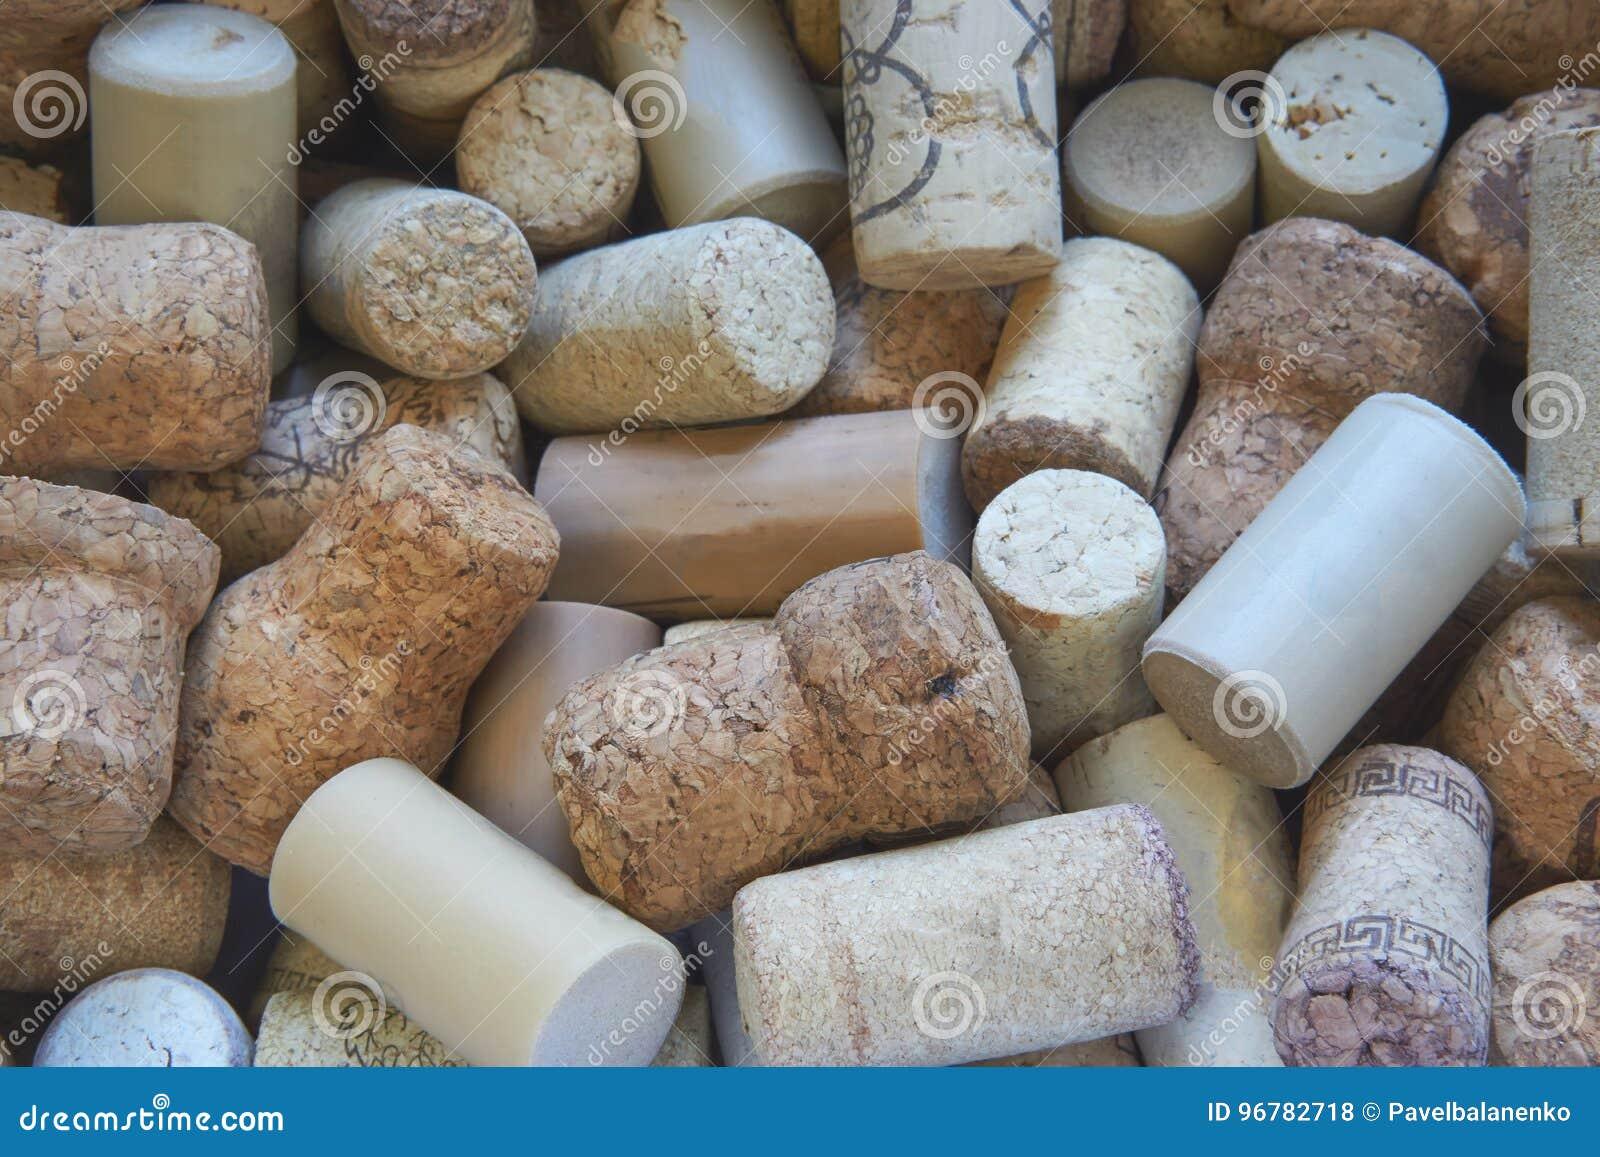 Closeup shot a lot of wine corks